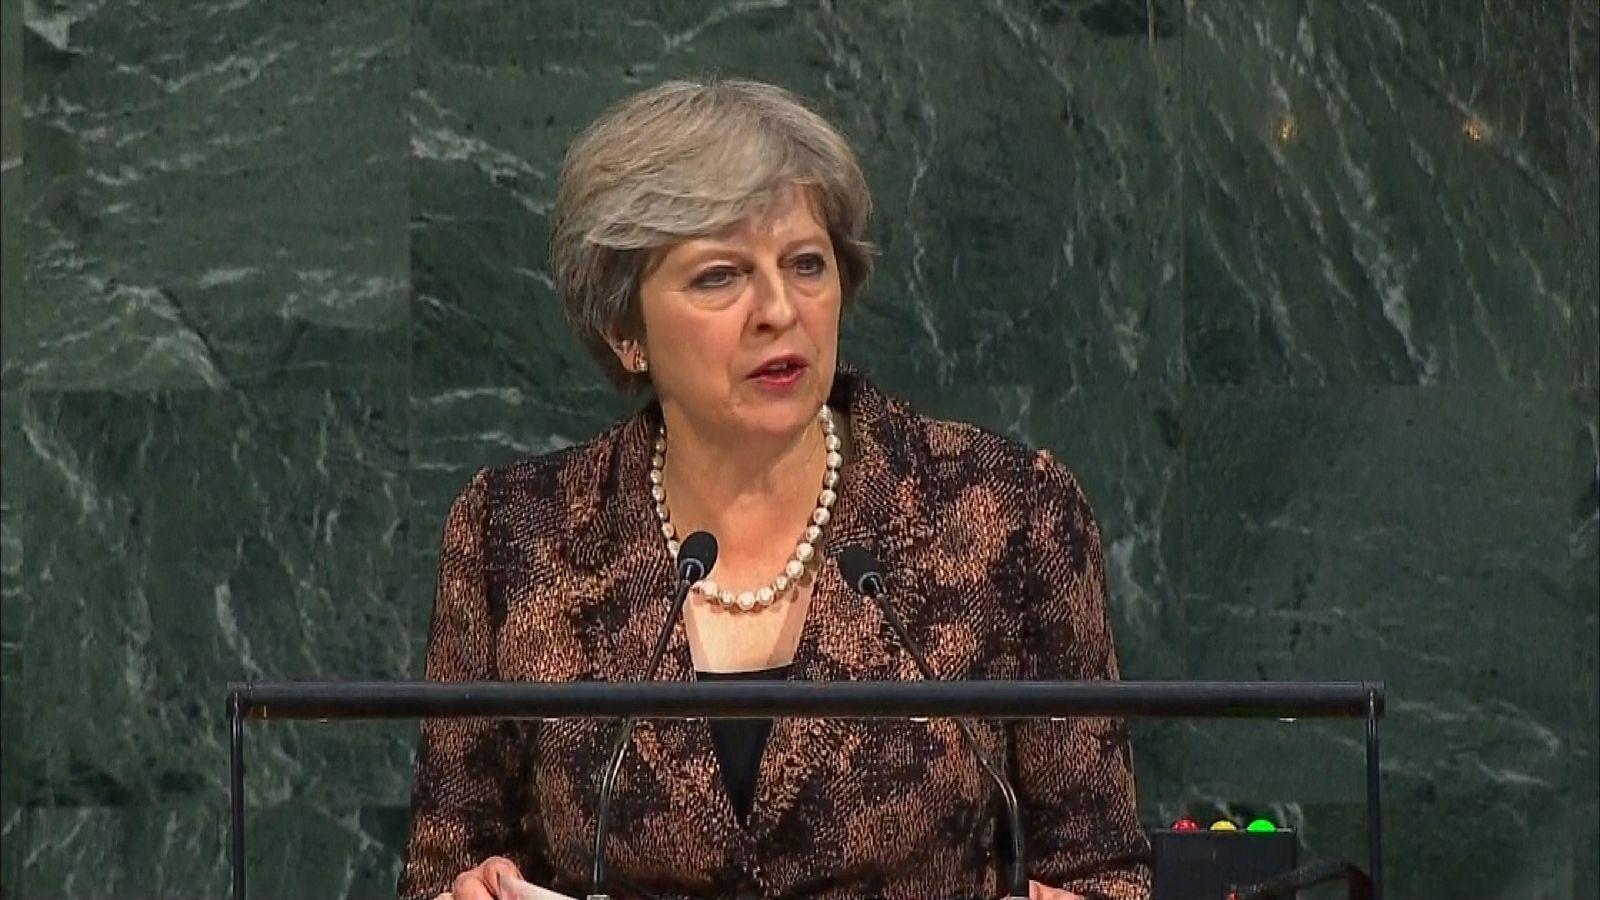 Theresa May at UN General Assembly in New York